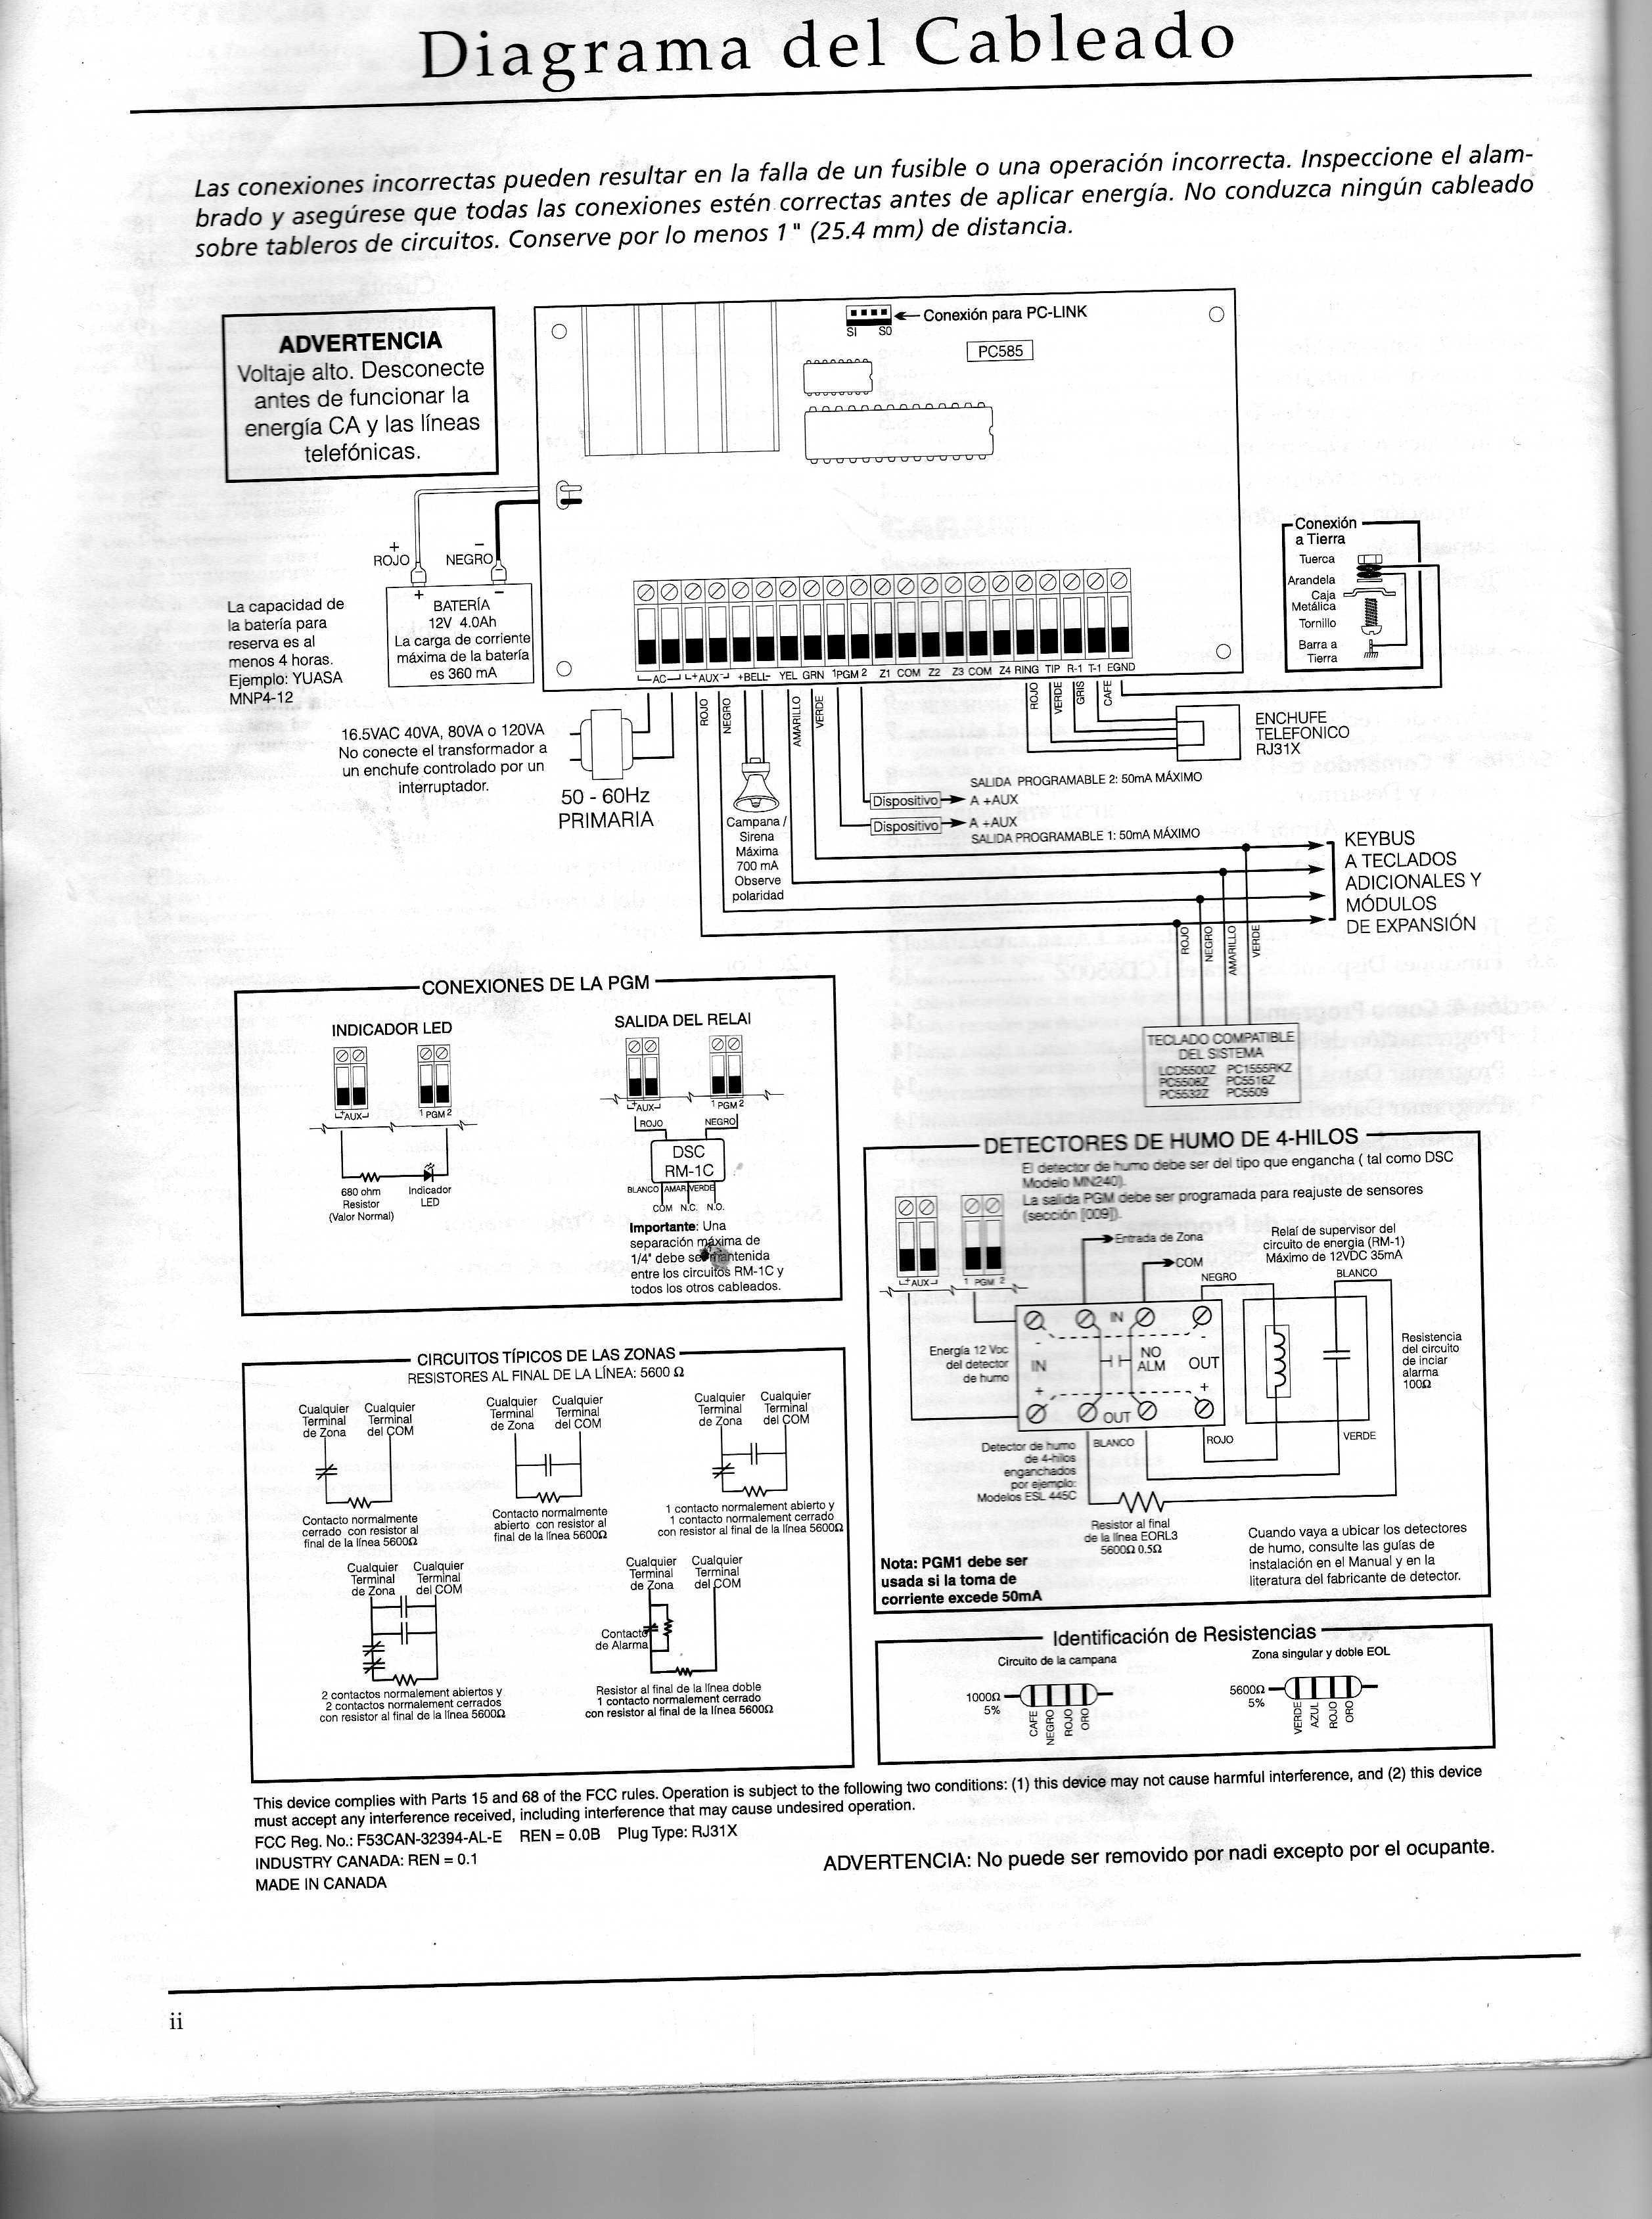 Dsc Classic Pc585 Img012 Jpg Diagramas De Alarmas